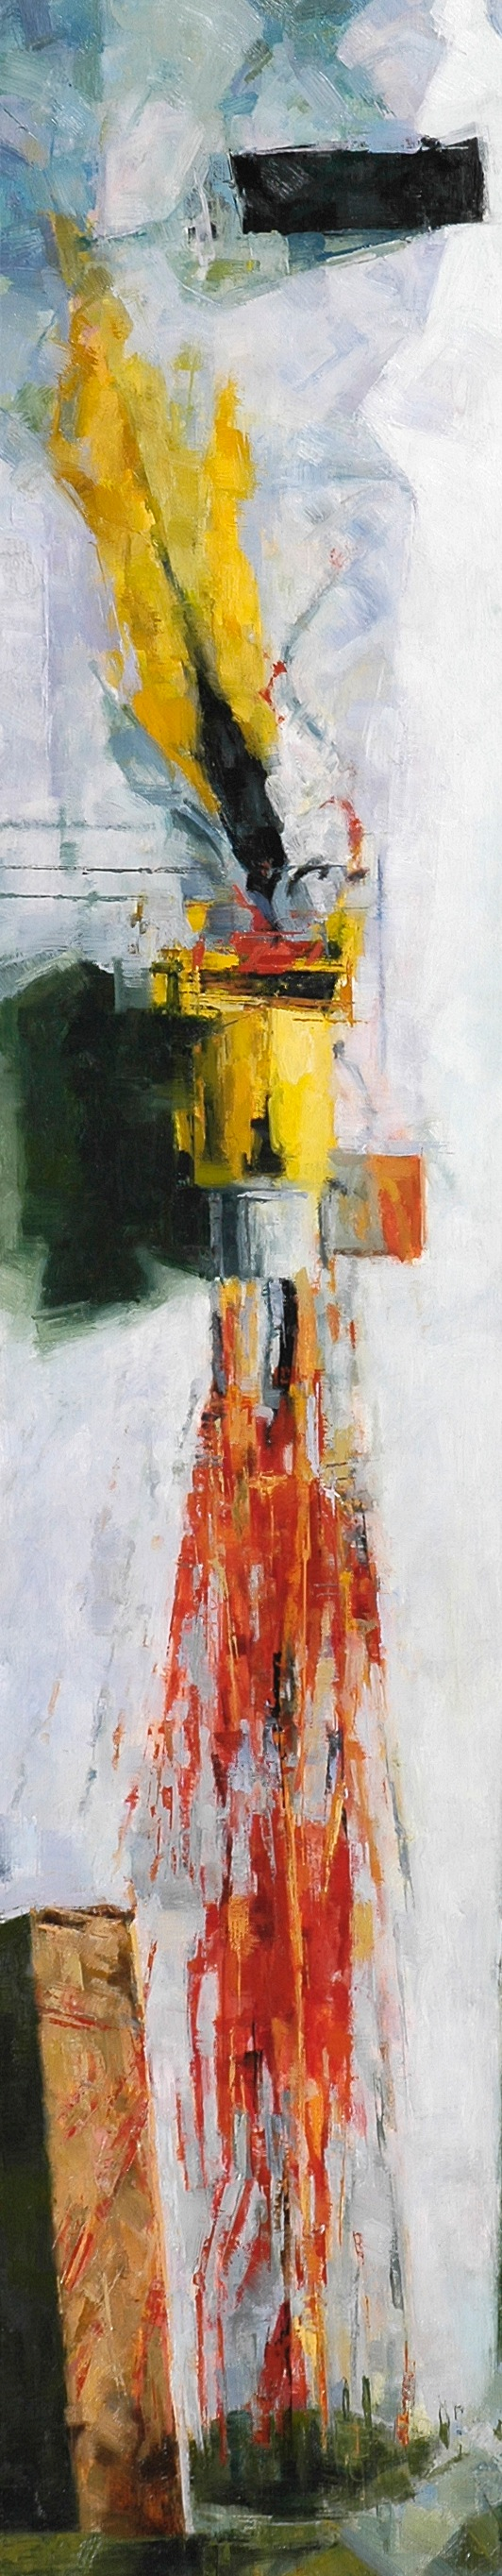 Retek – Sprayed Paint - 2004